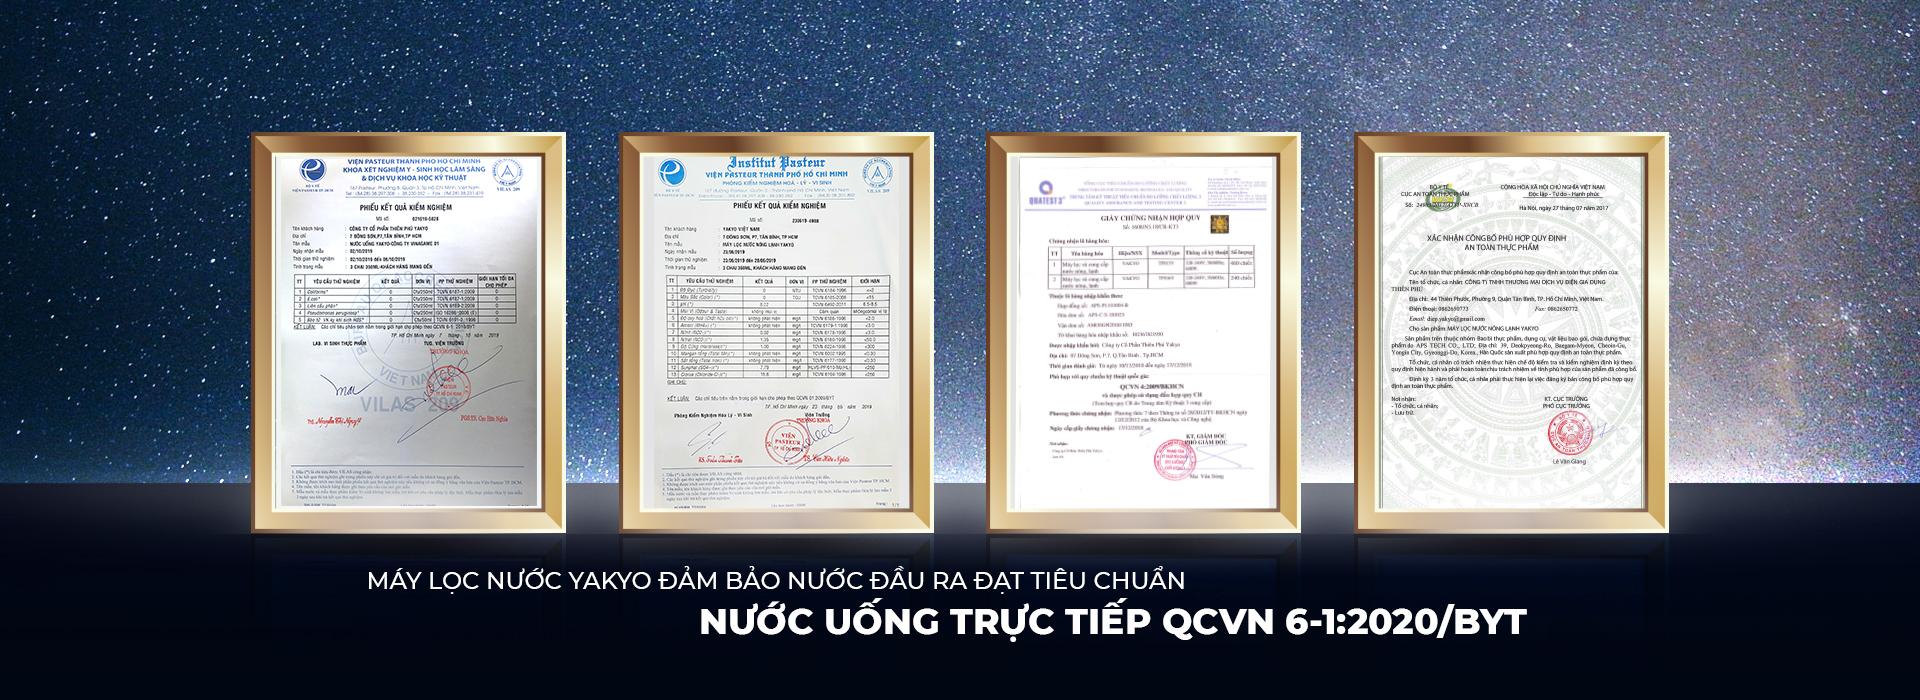 chung-nhan-may-loc-nuoc-yakyo